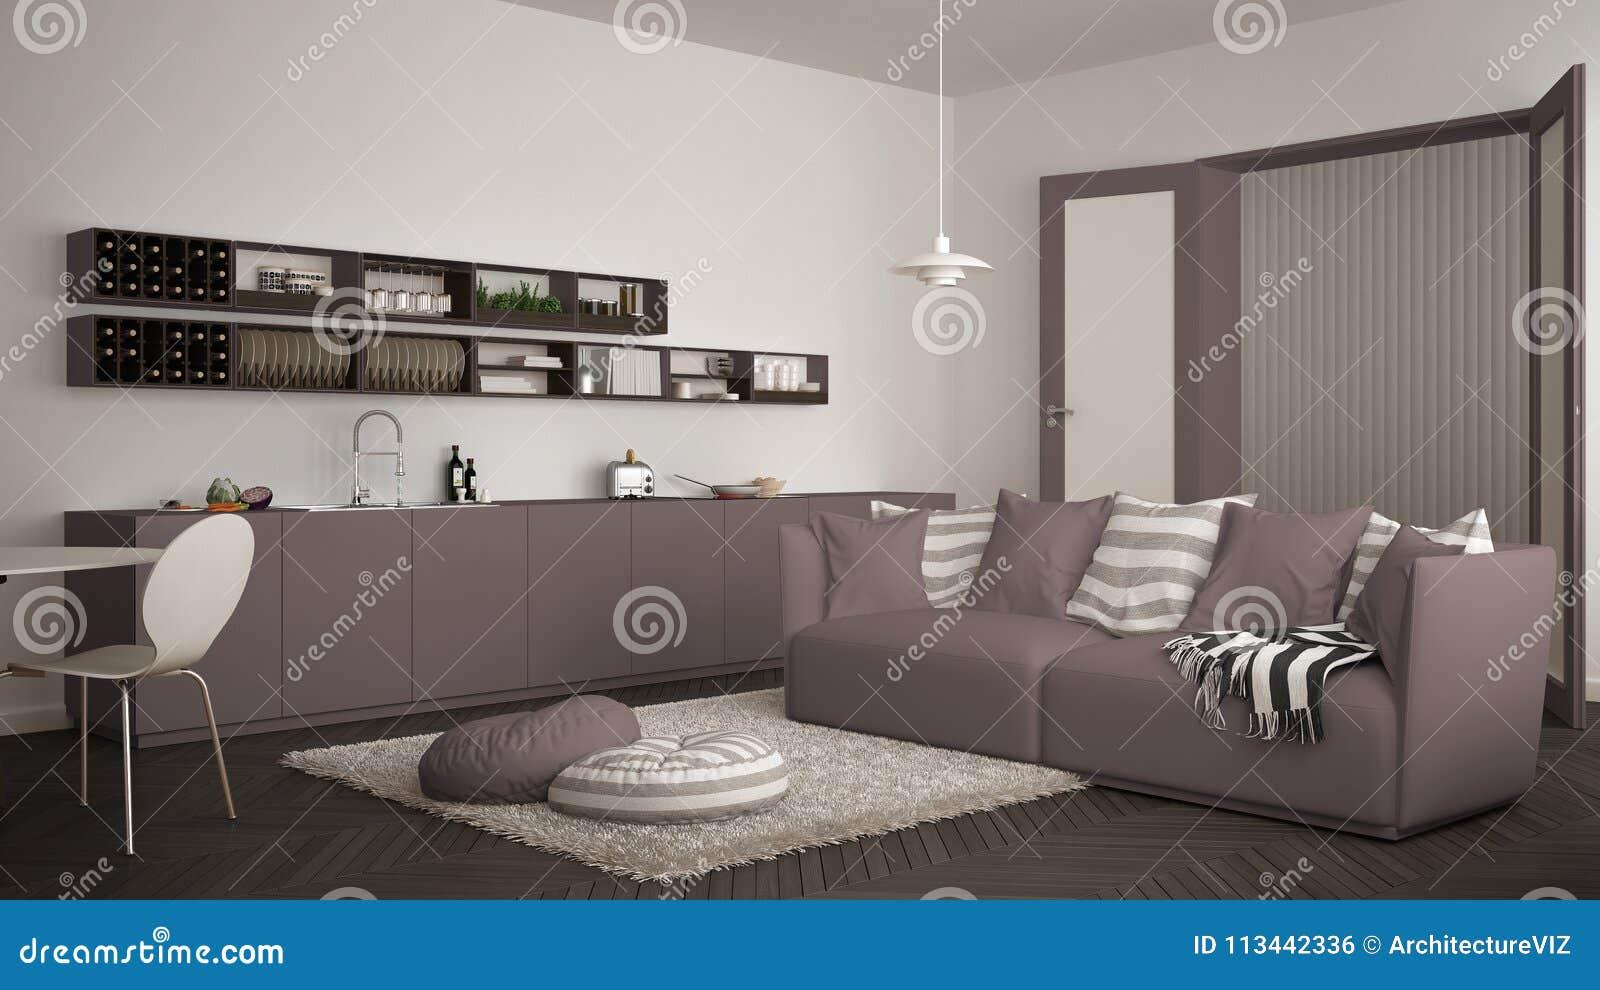 thumbs.dreamstime.com/z/salon-moderne-scandinave-a...